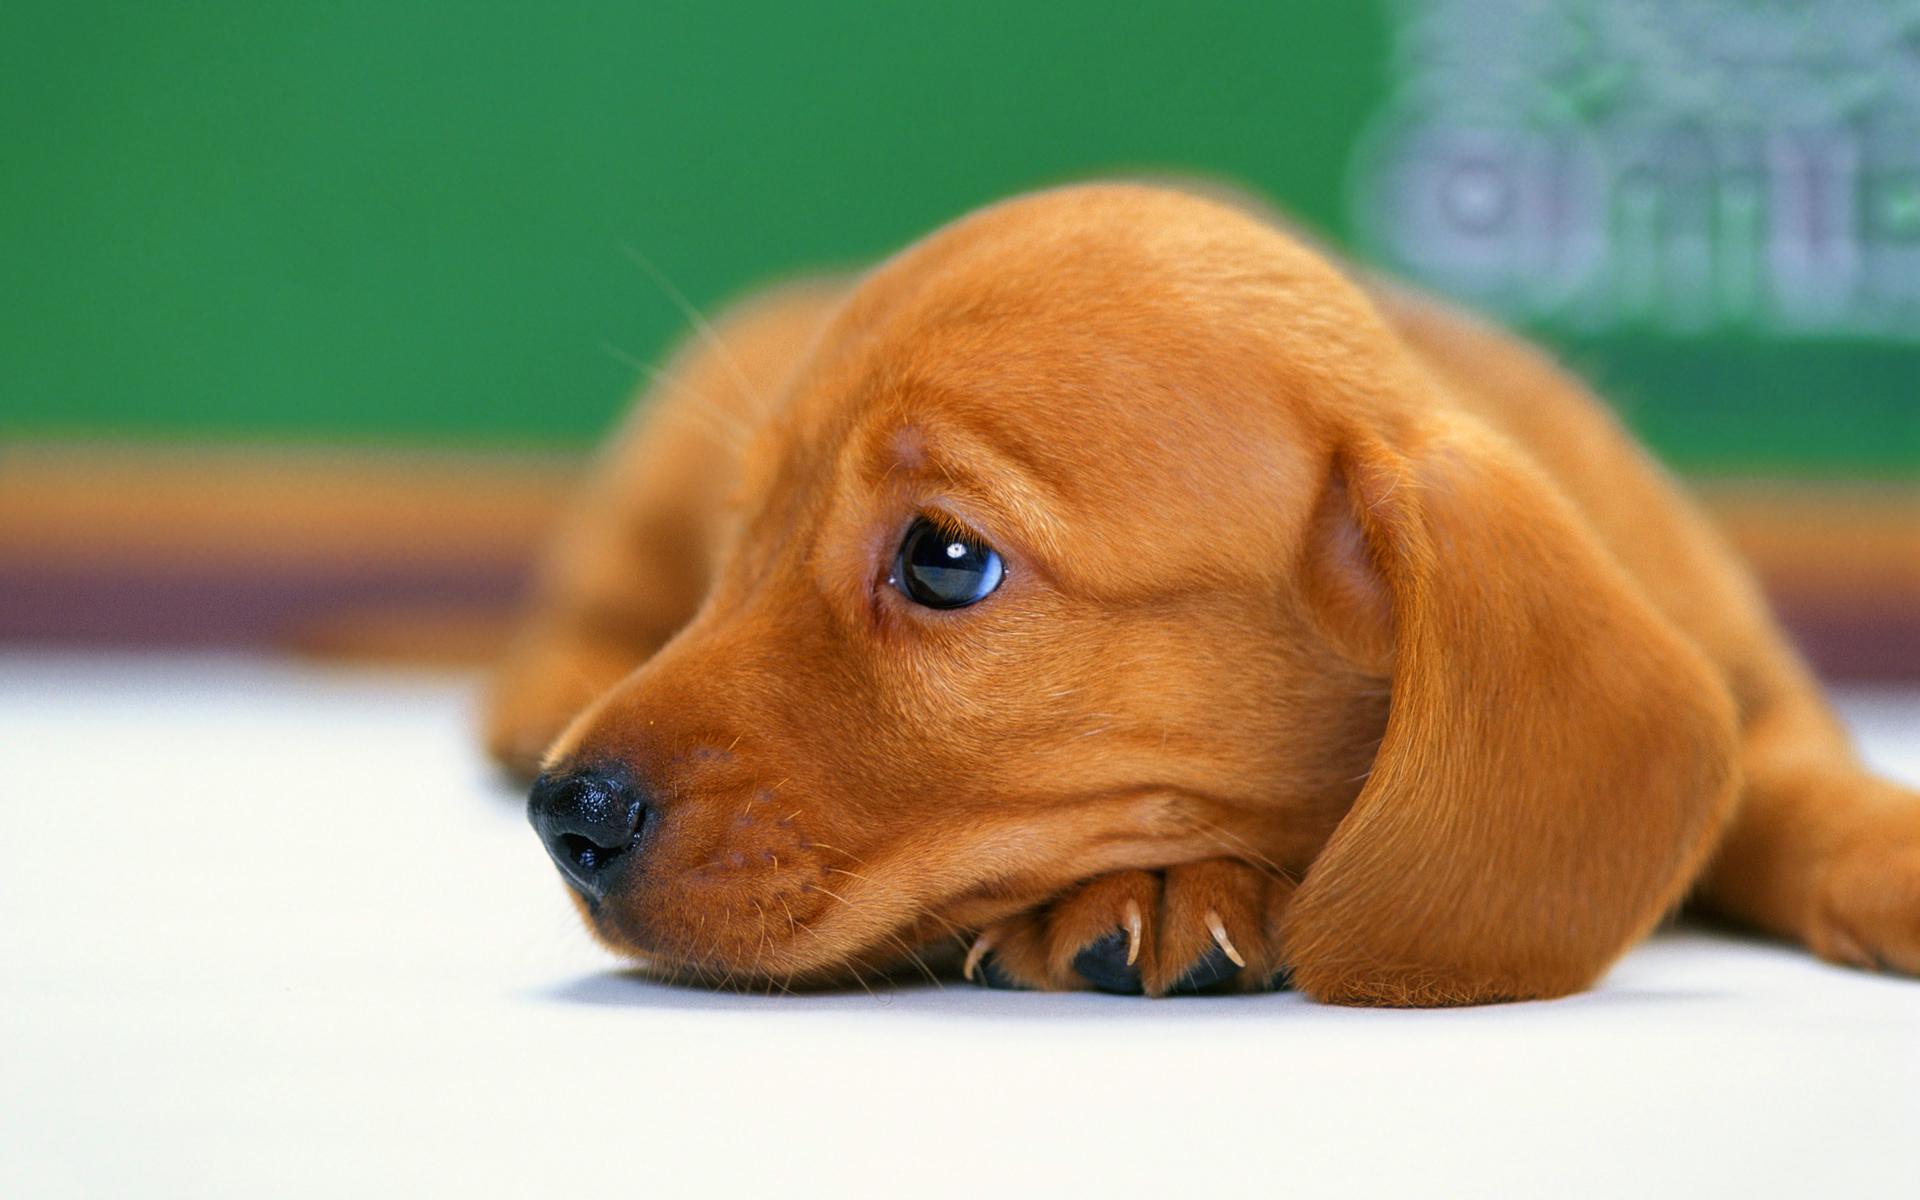 Cute Baby Pets Live Wallpaper Download Puppy Bored Hd Desktop Wallpapers 4k Hd